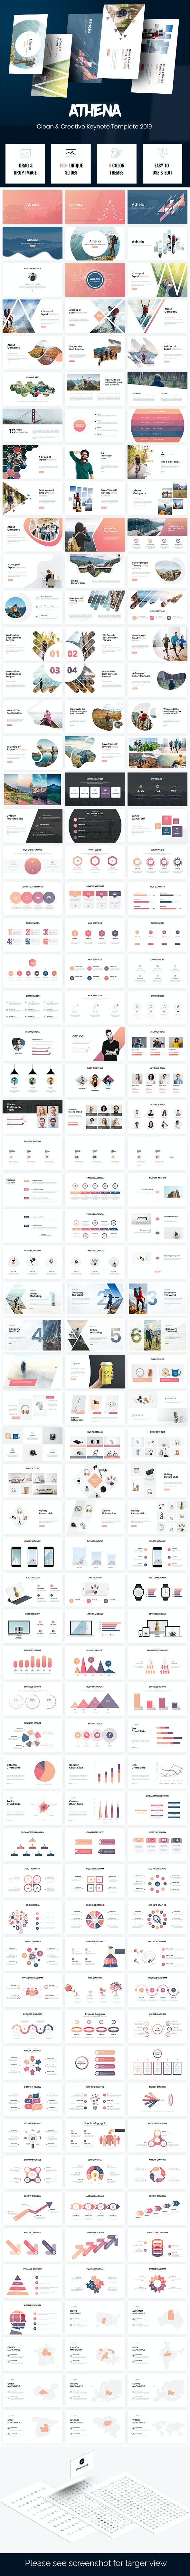 Athena - Creative Keynote Template 2019 - Creative Keynote Templates